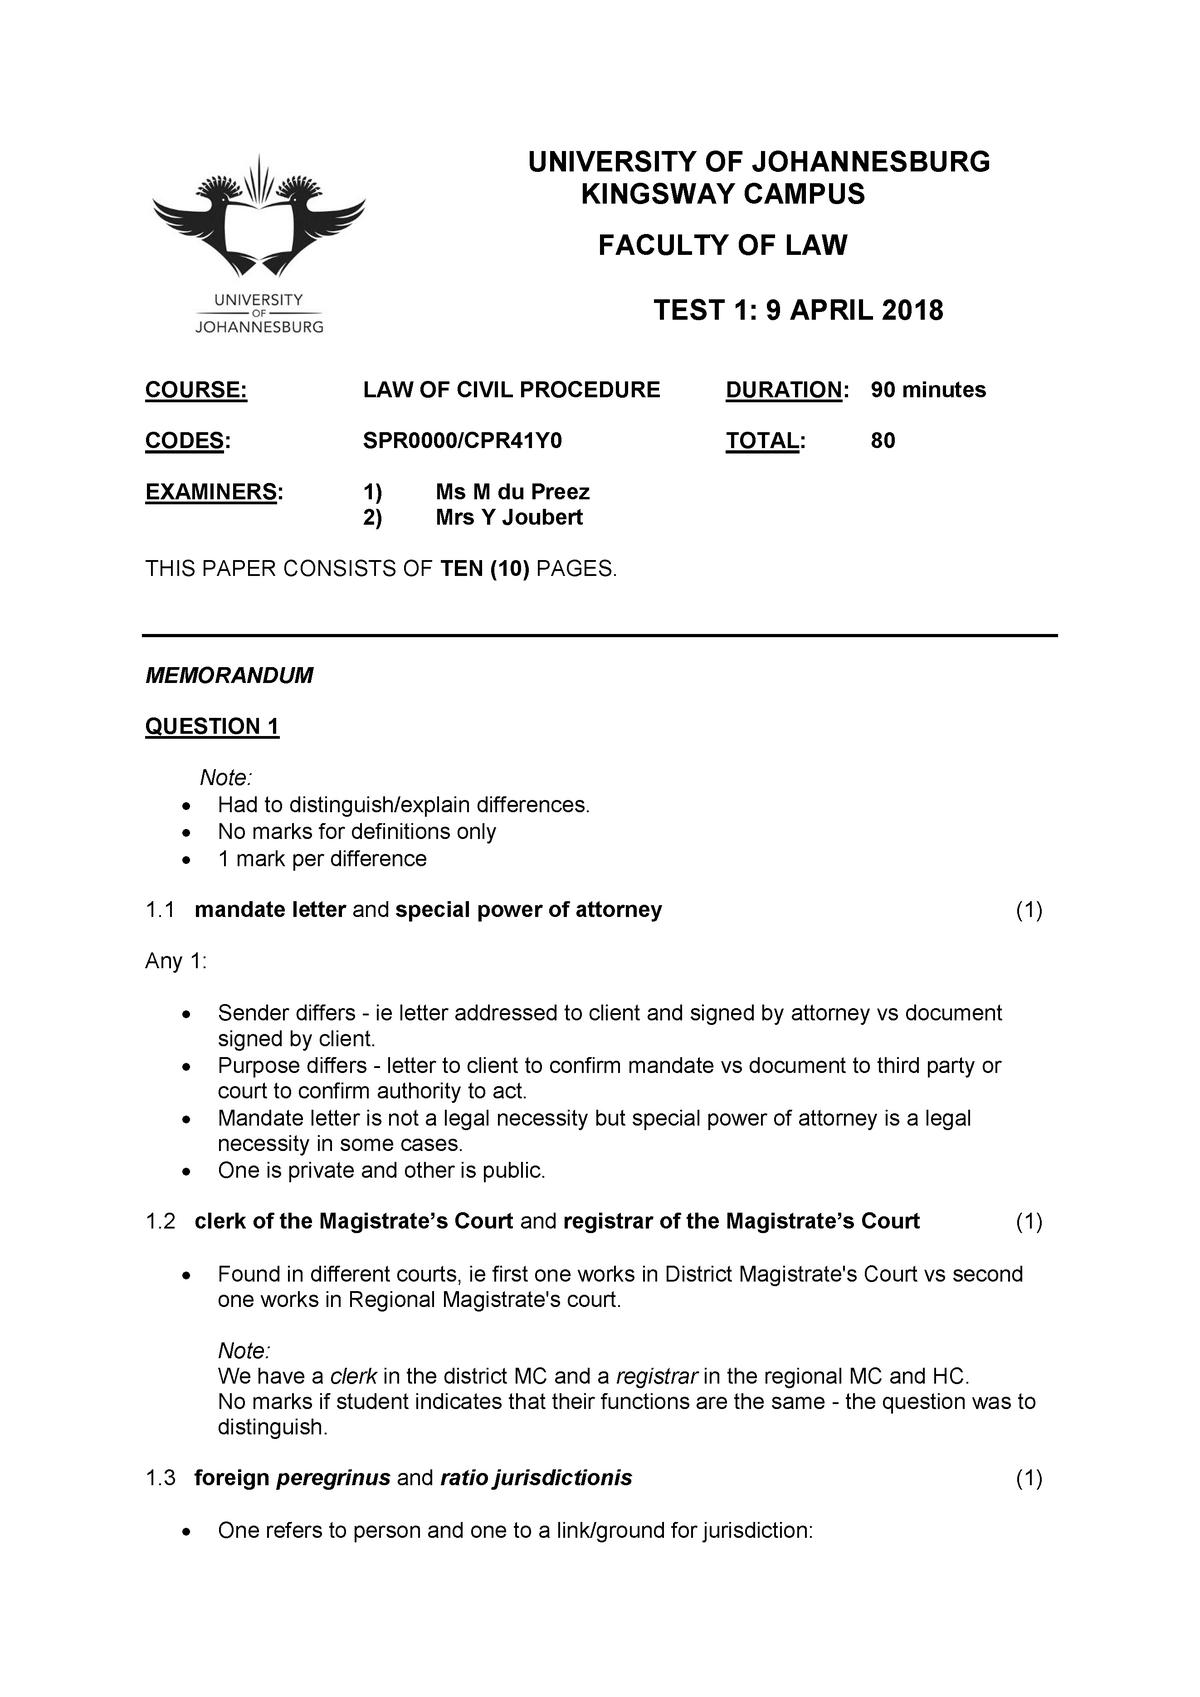 Exam 2018 - CPR41Y0: Law of Civil Procedure - StuDocu